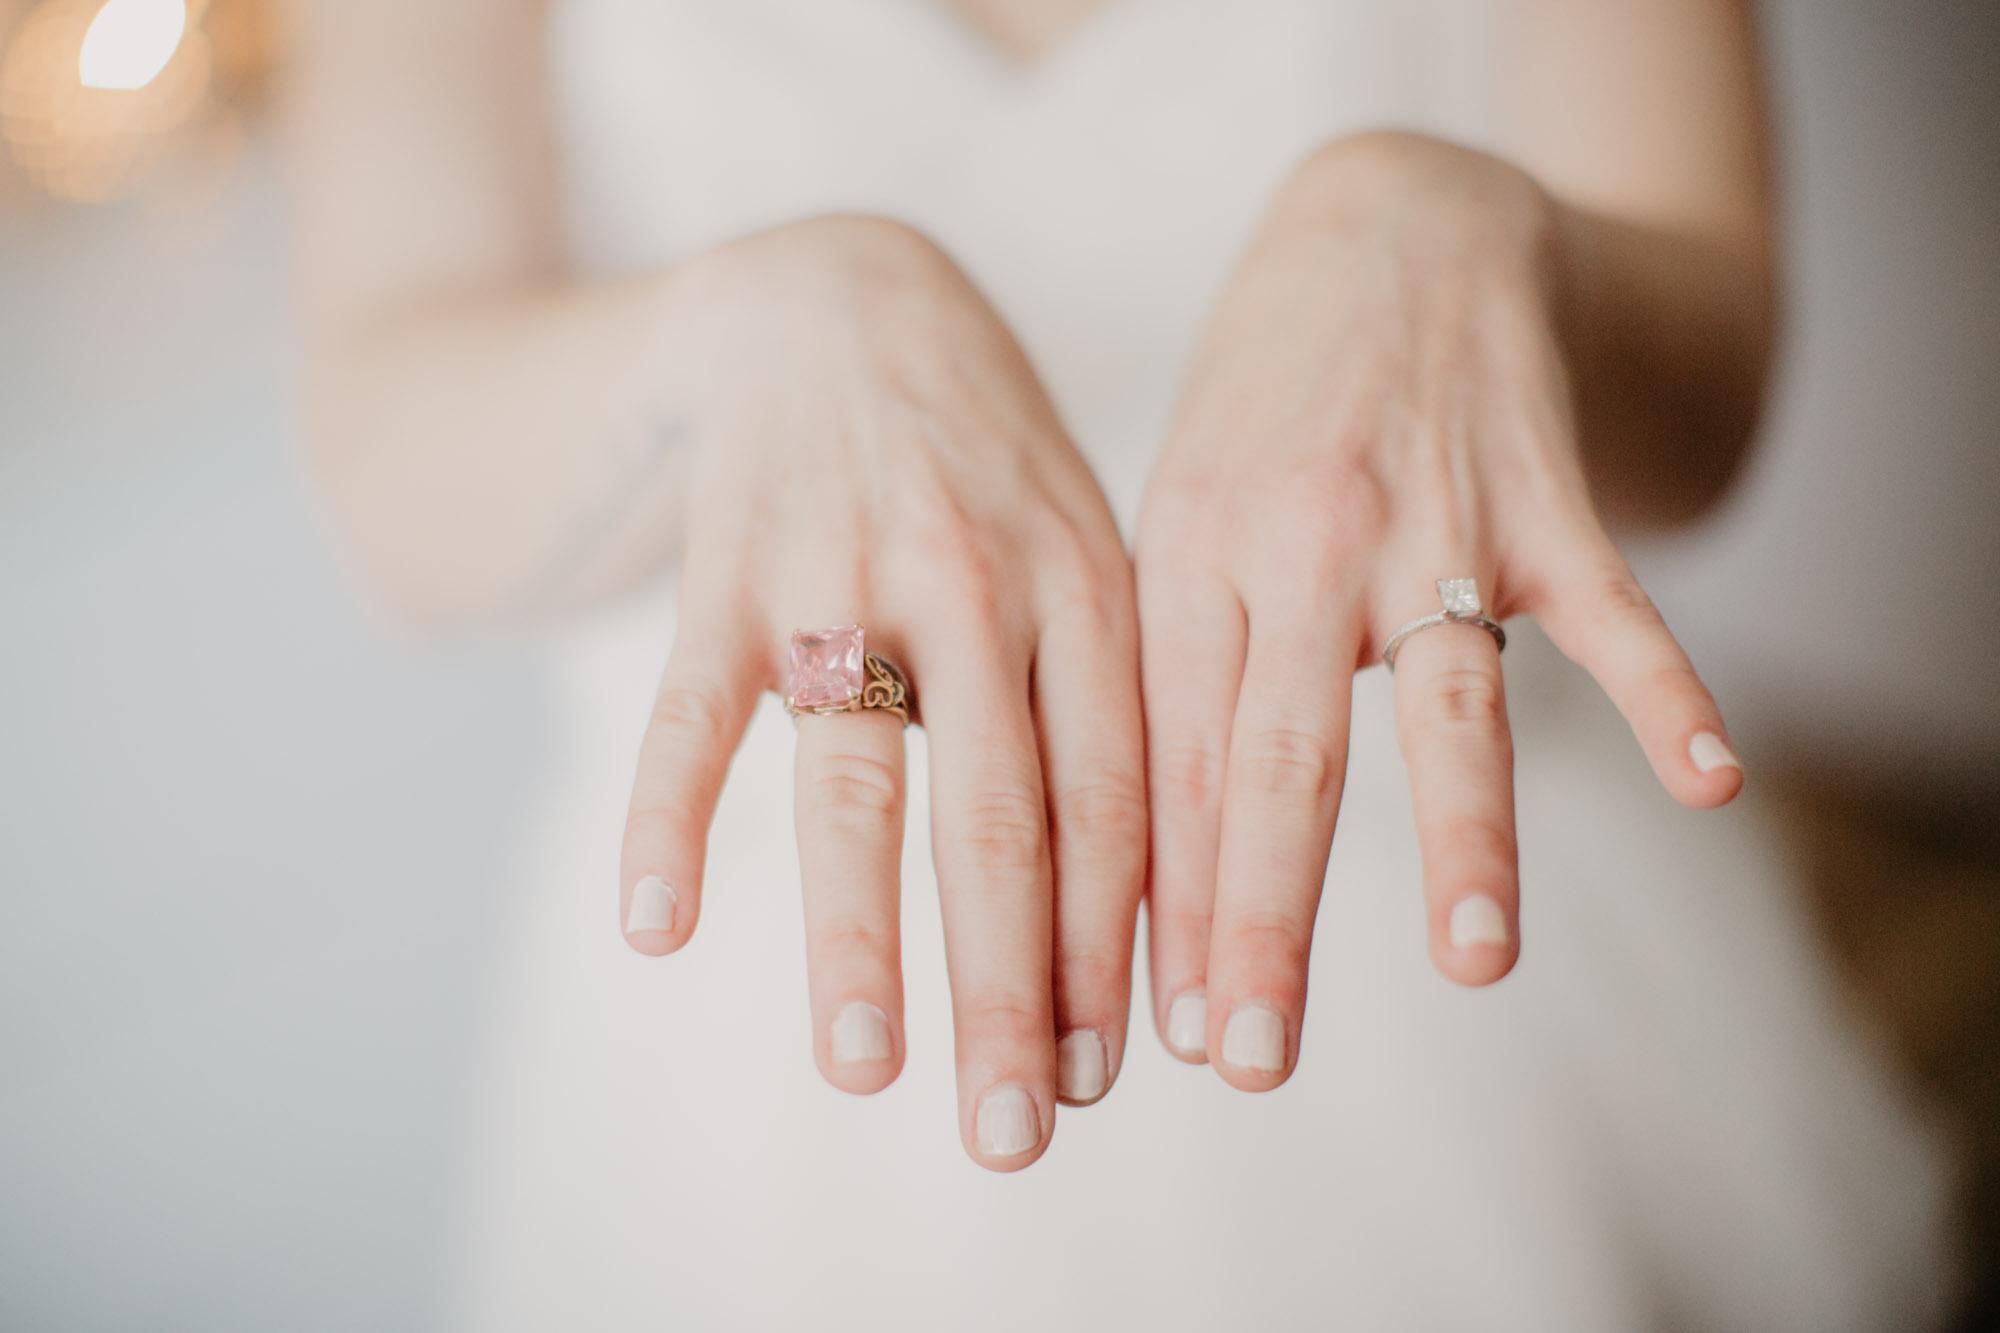 omaha-wedding-photographer-meghan-time-15.jpg